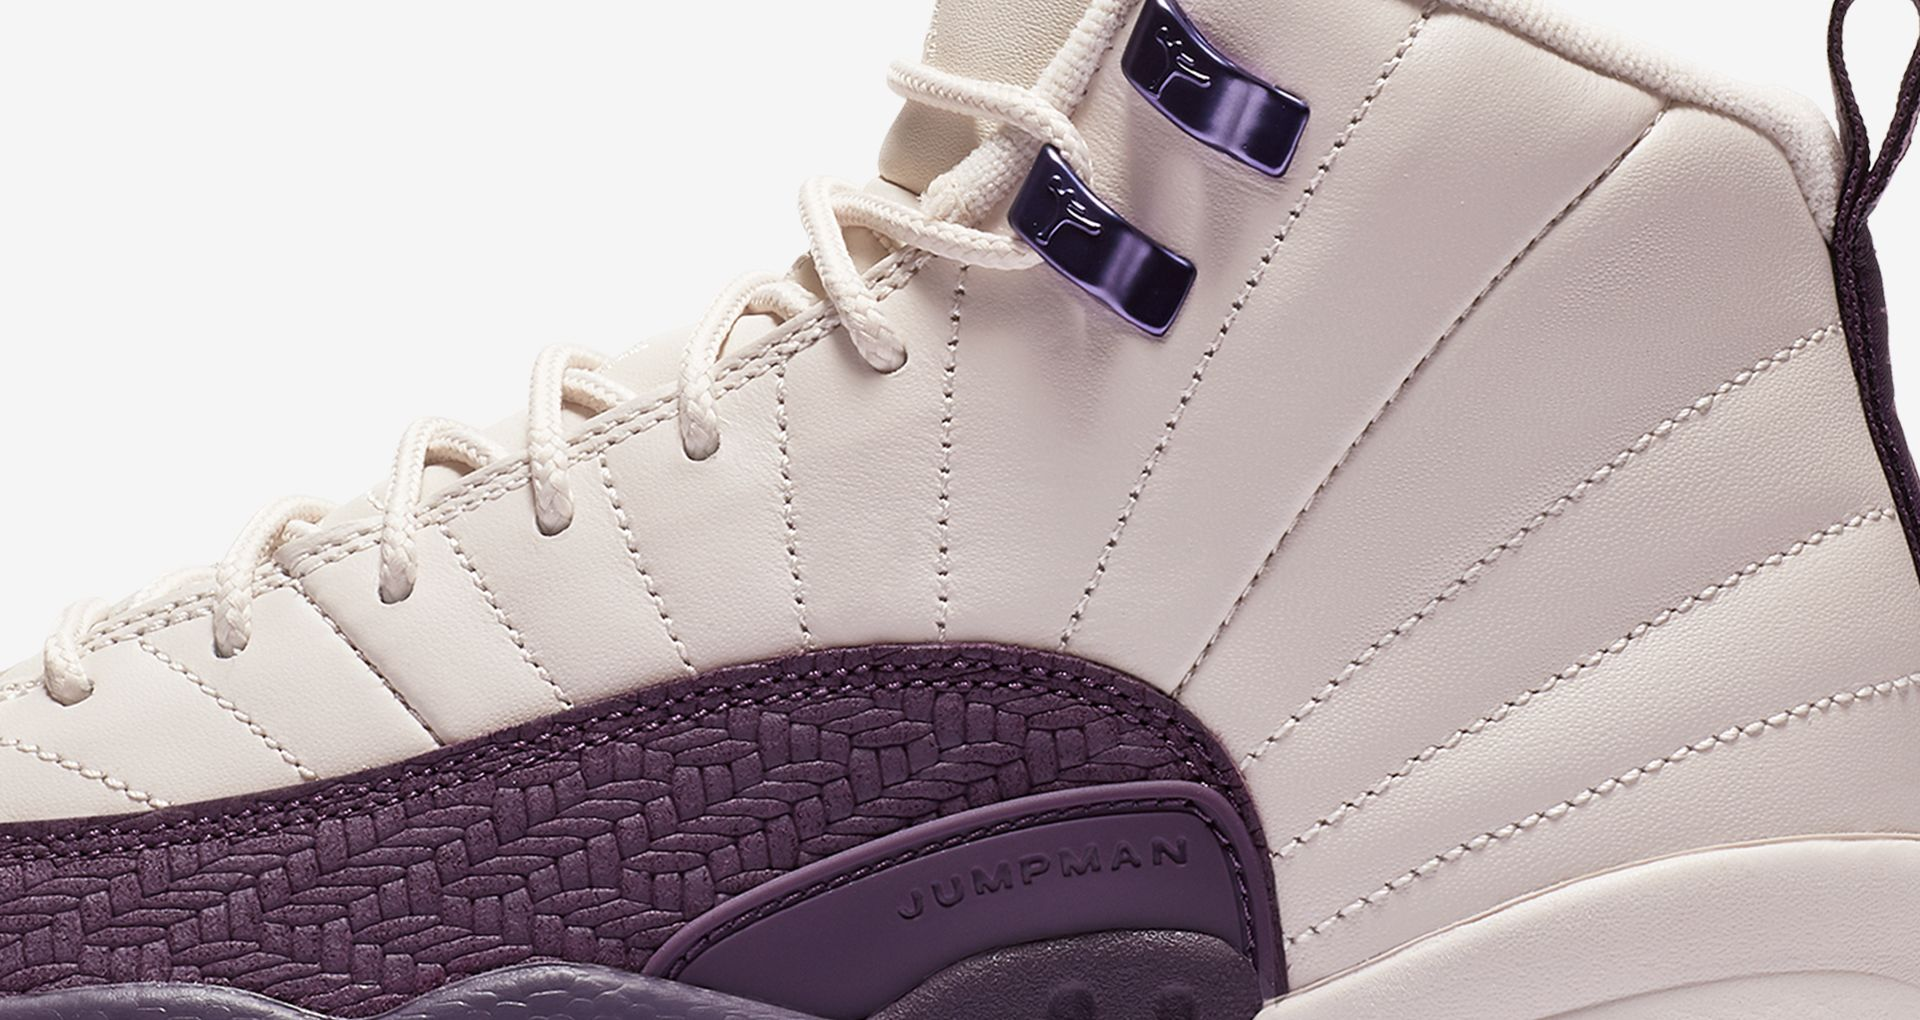 best service f63fc 9e262 Big Kids' Air Jordan 12 Retro 'Desert Sand & Pro Purple ...